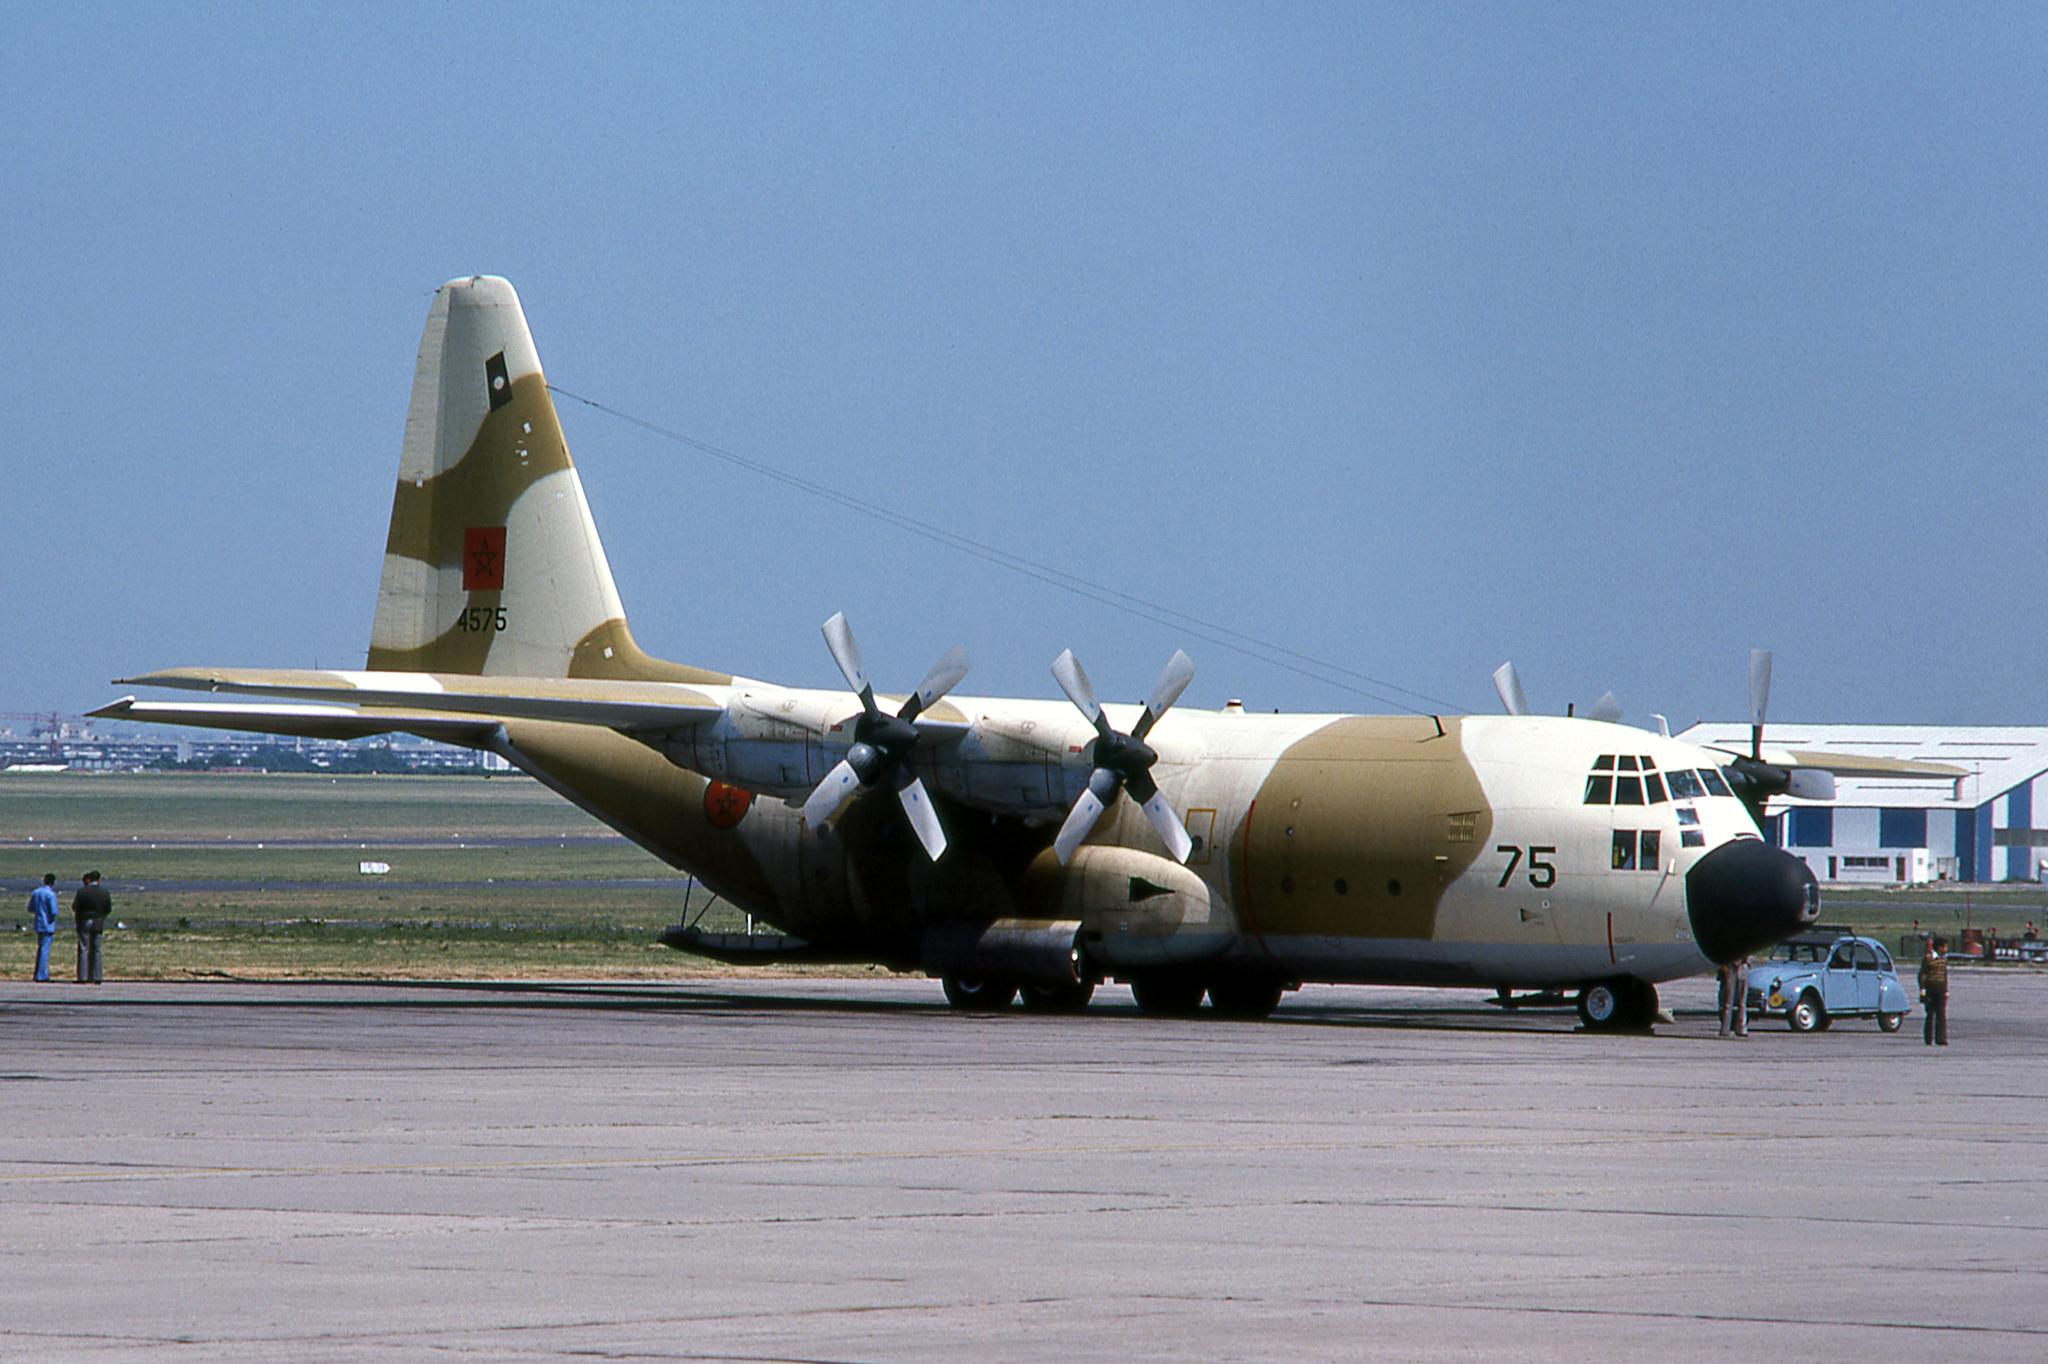 FRA: Photos d'avions de transport - Page 38 48463314616_01f29f9d7a_o